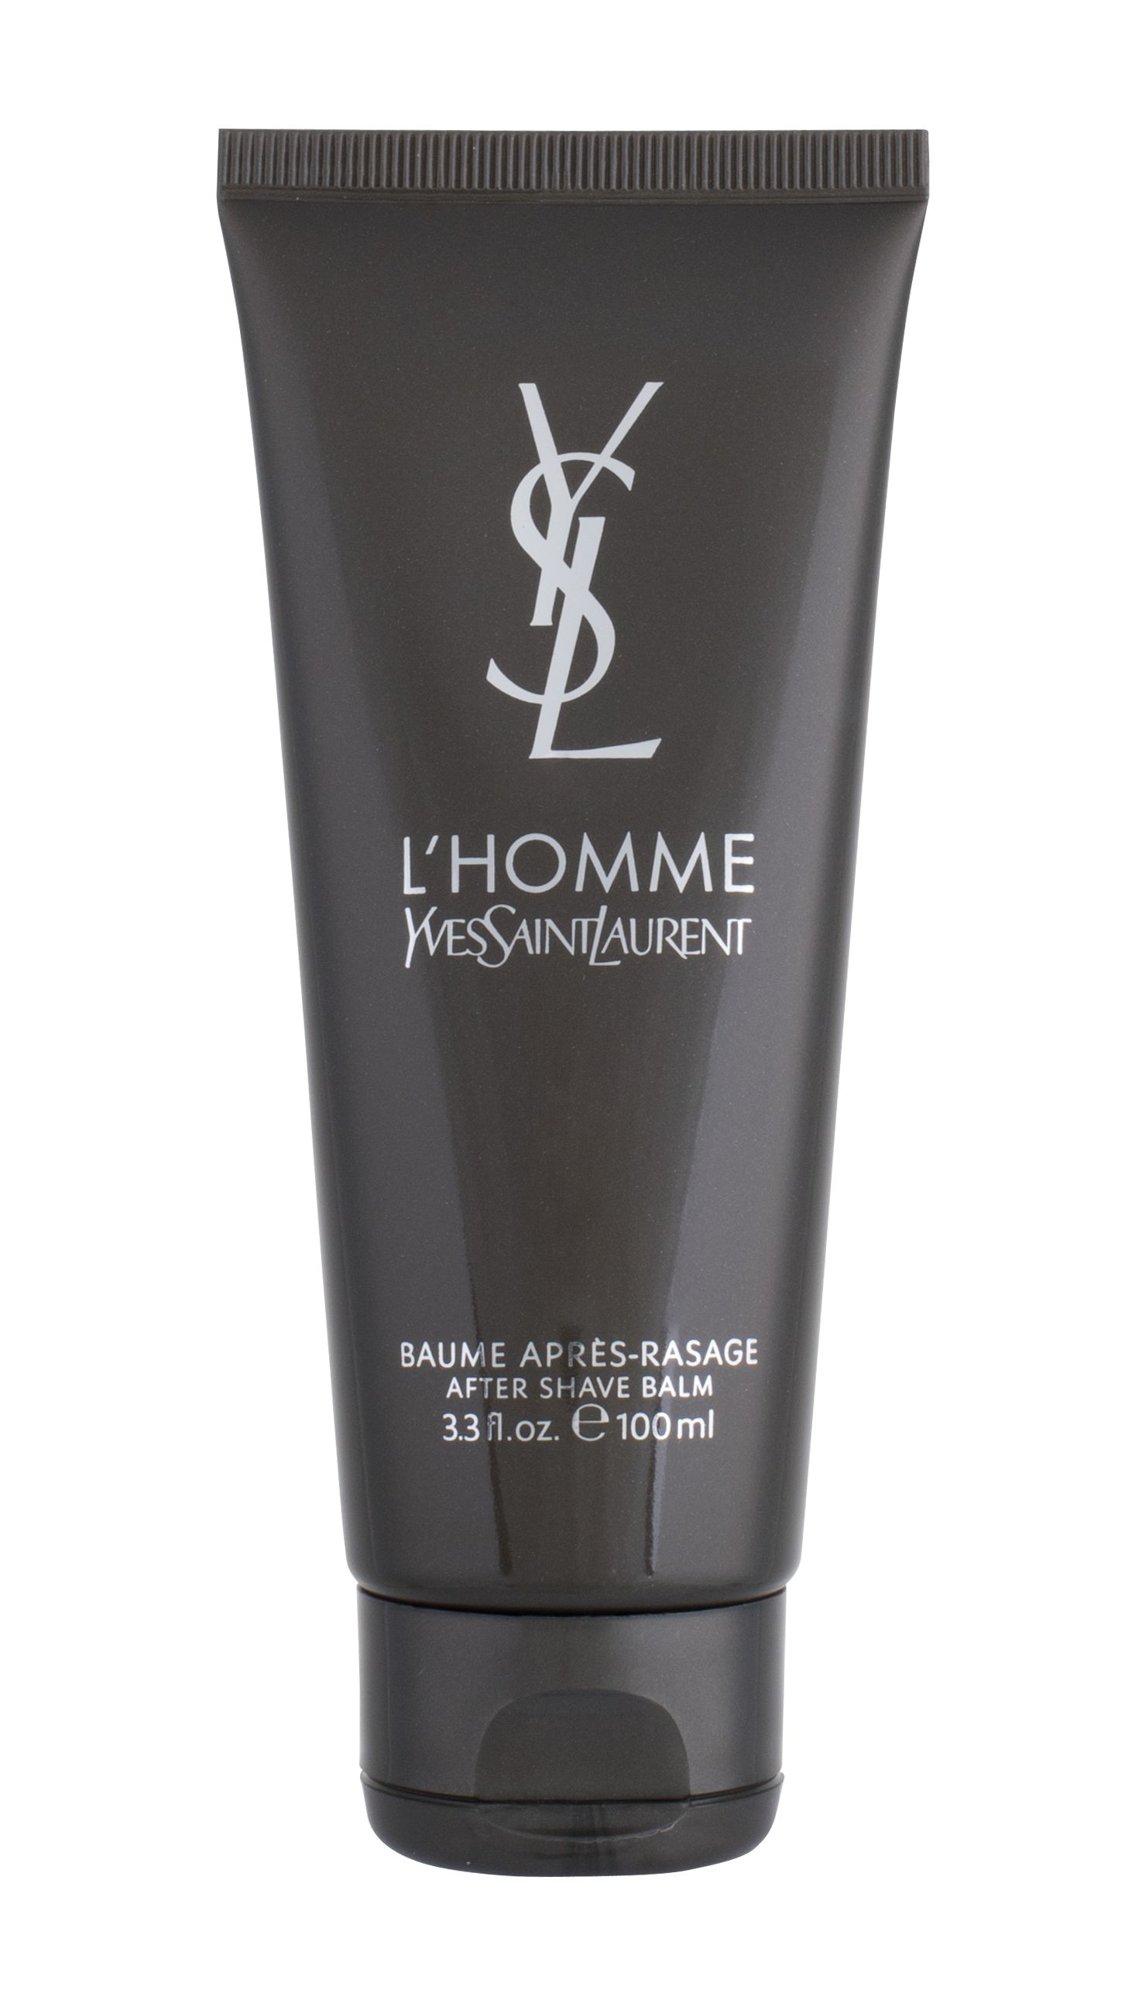 Yves Saint Laurent L´Homme After shave balm 100ml